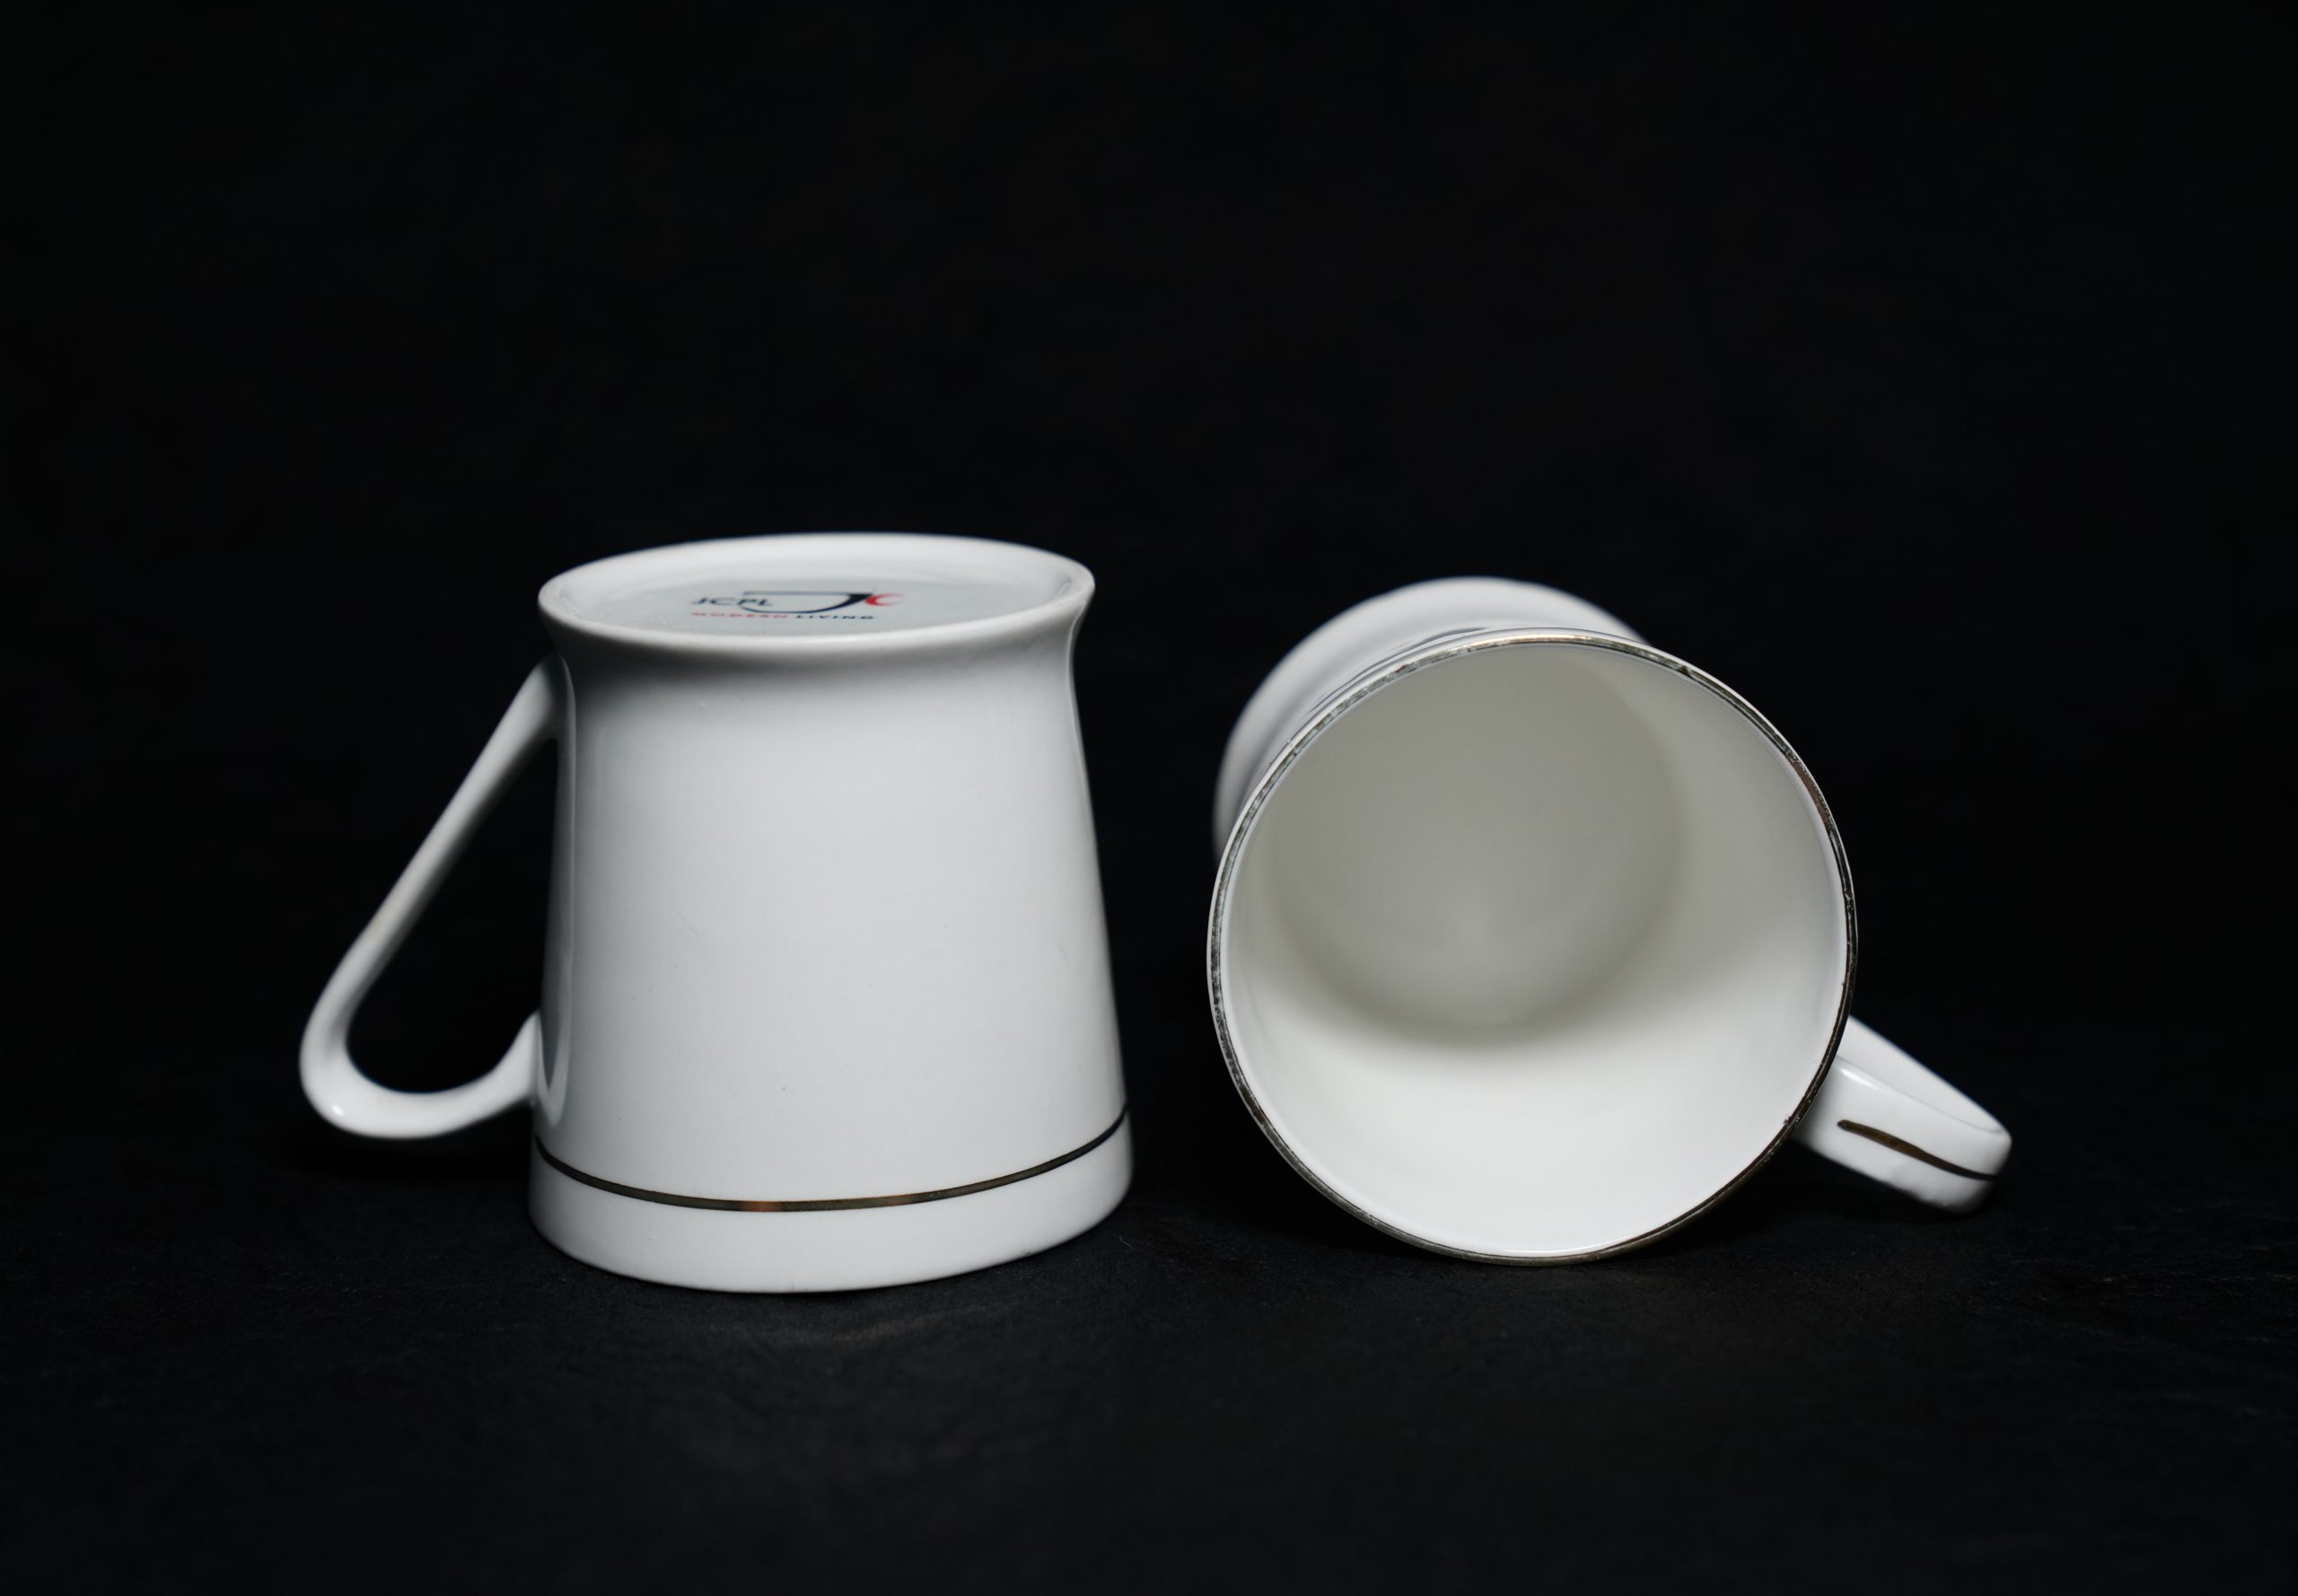 White tea cups